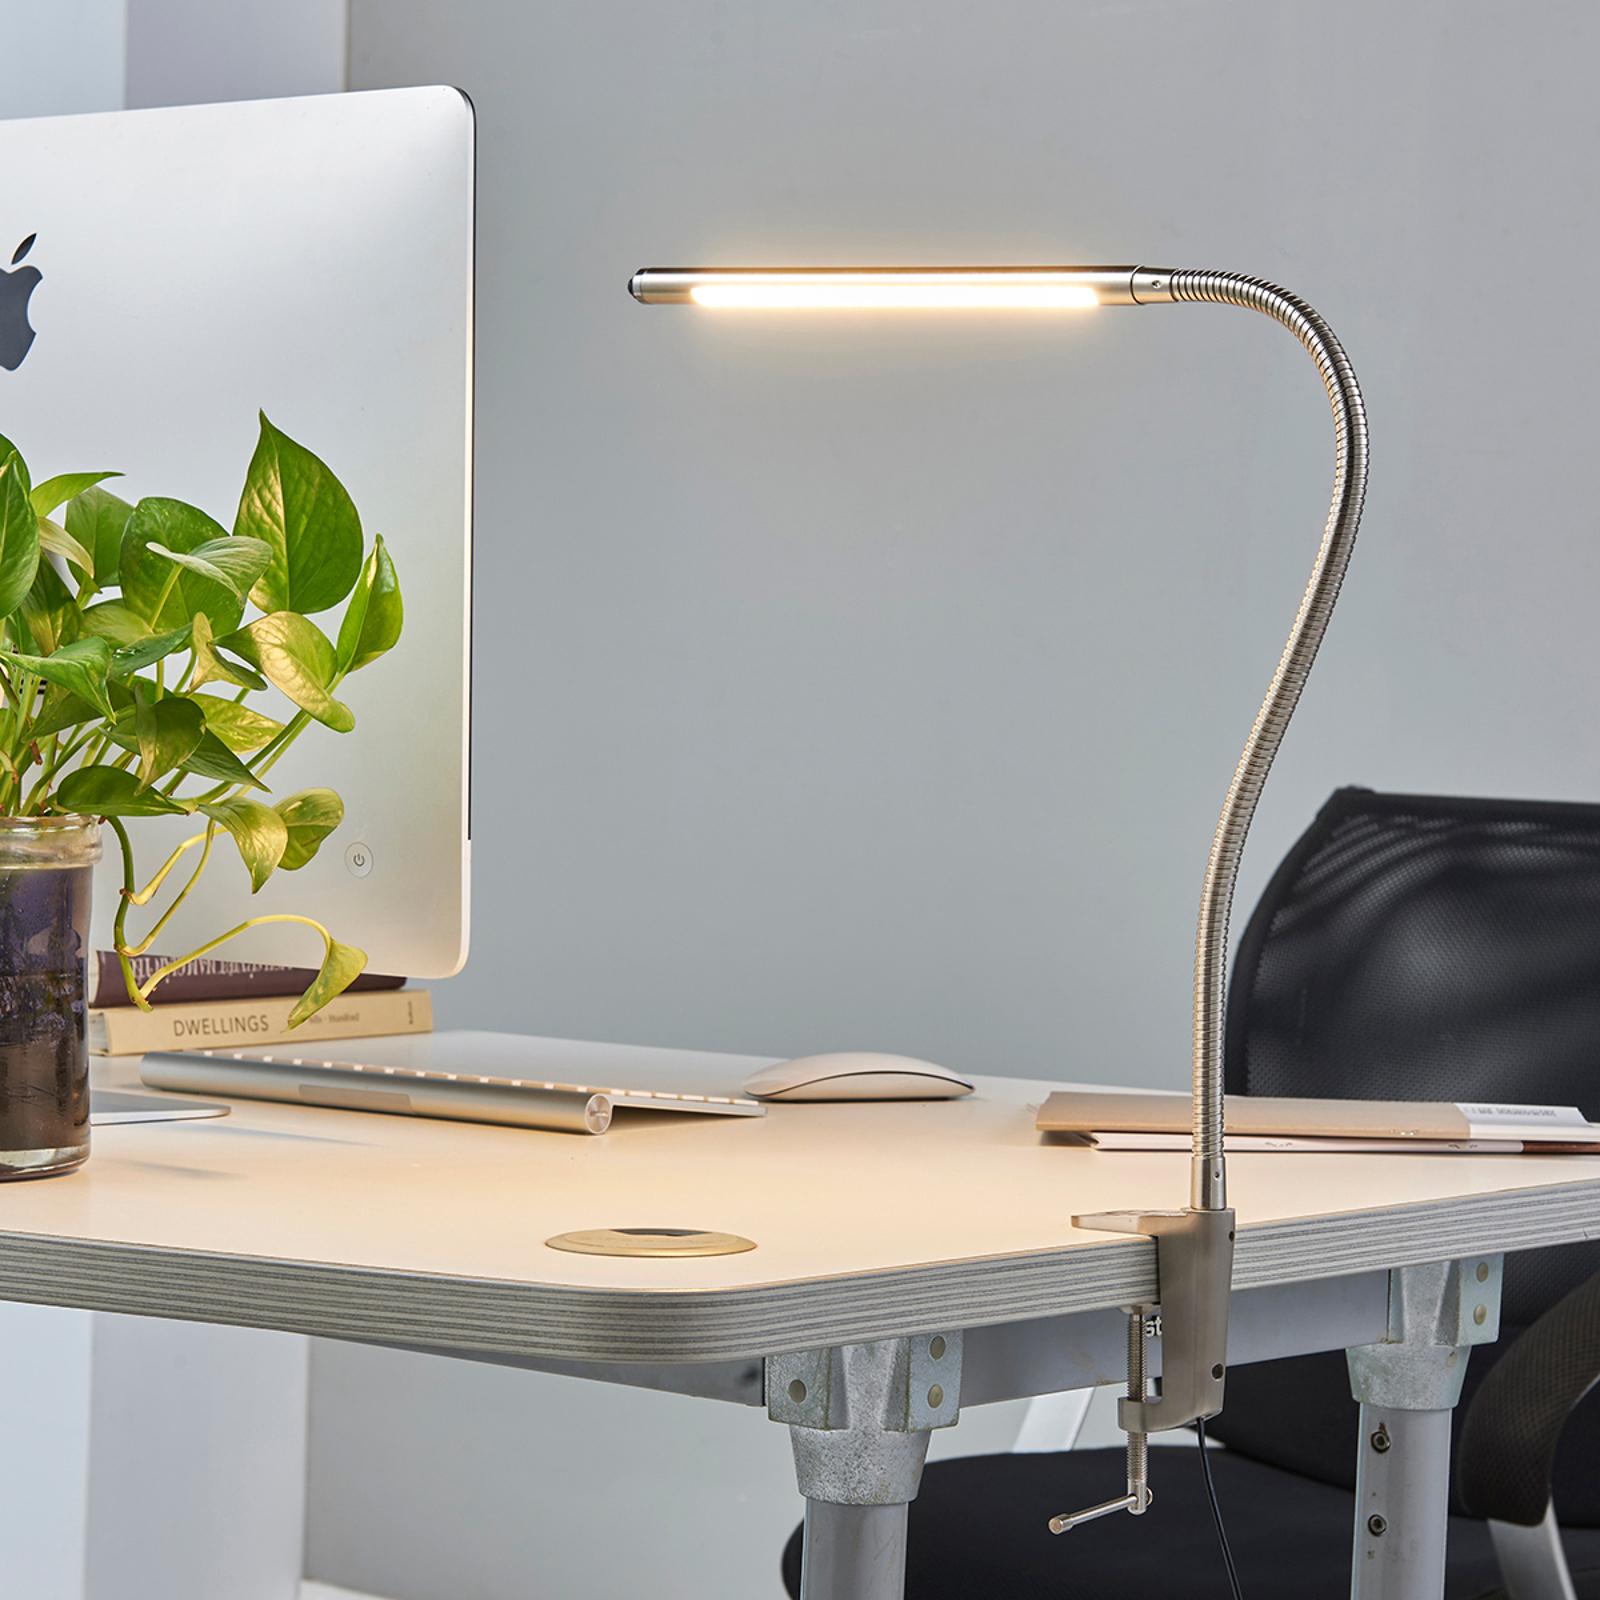 LED-klämlampa Lionard